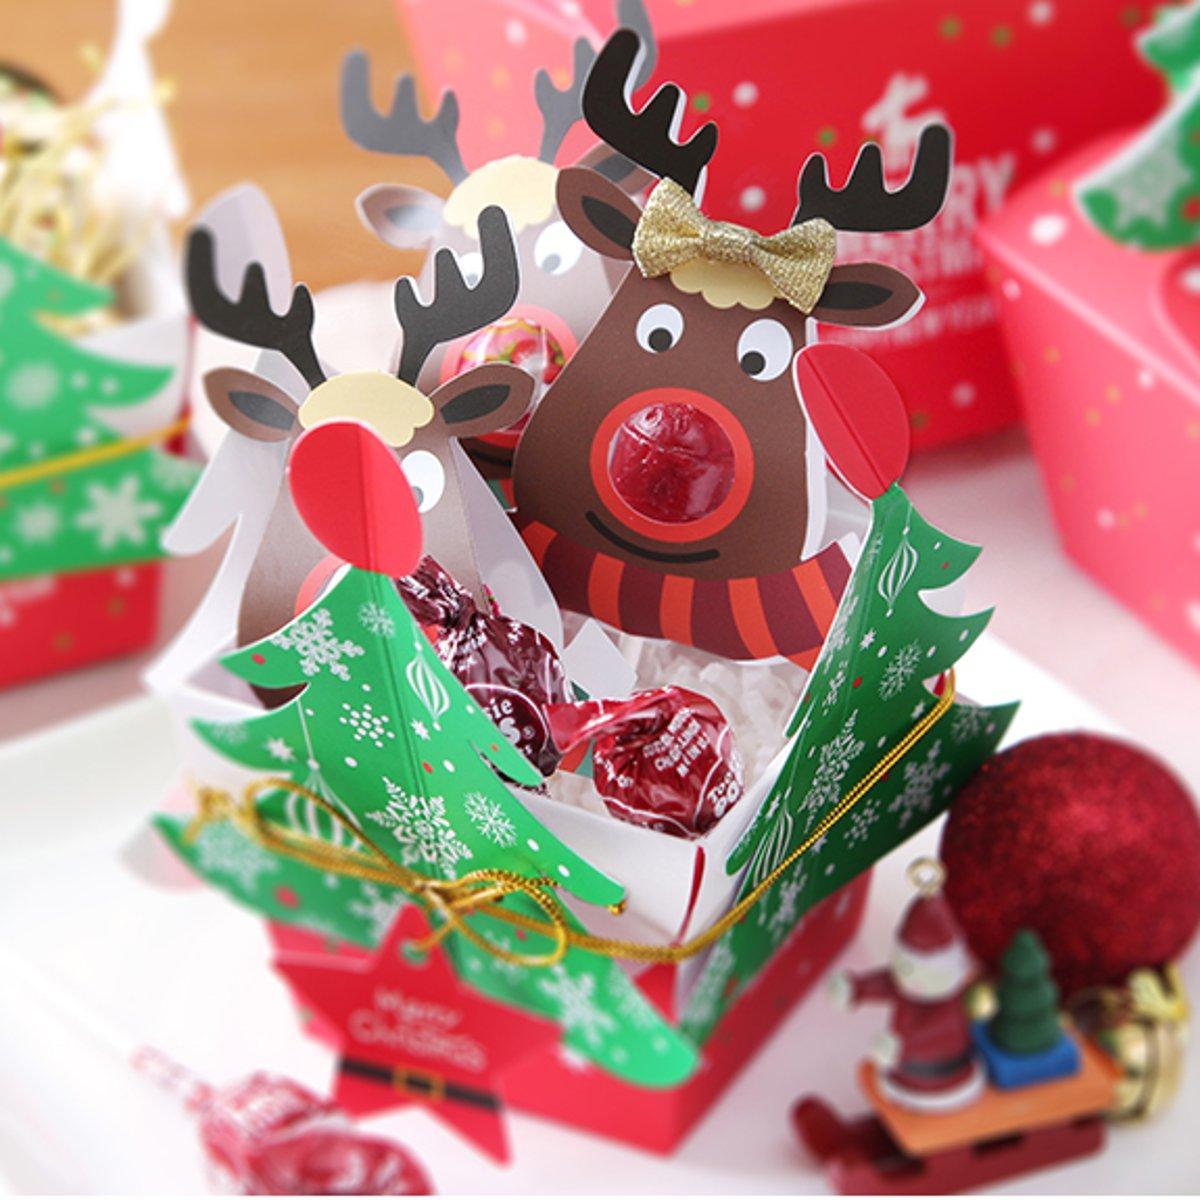 25 Pcs Cute Reindeer Lollipop Paper Card Decorations Christmas Candy Gift Decor